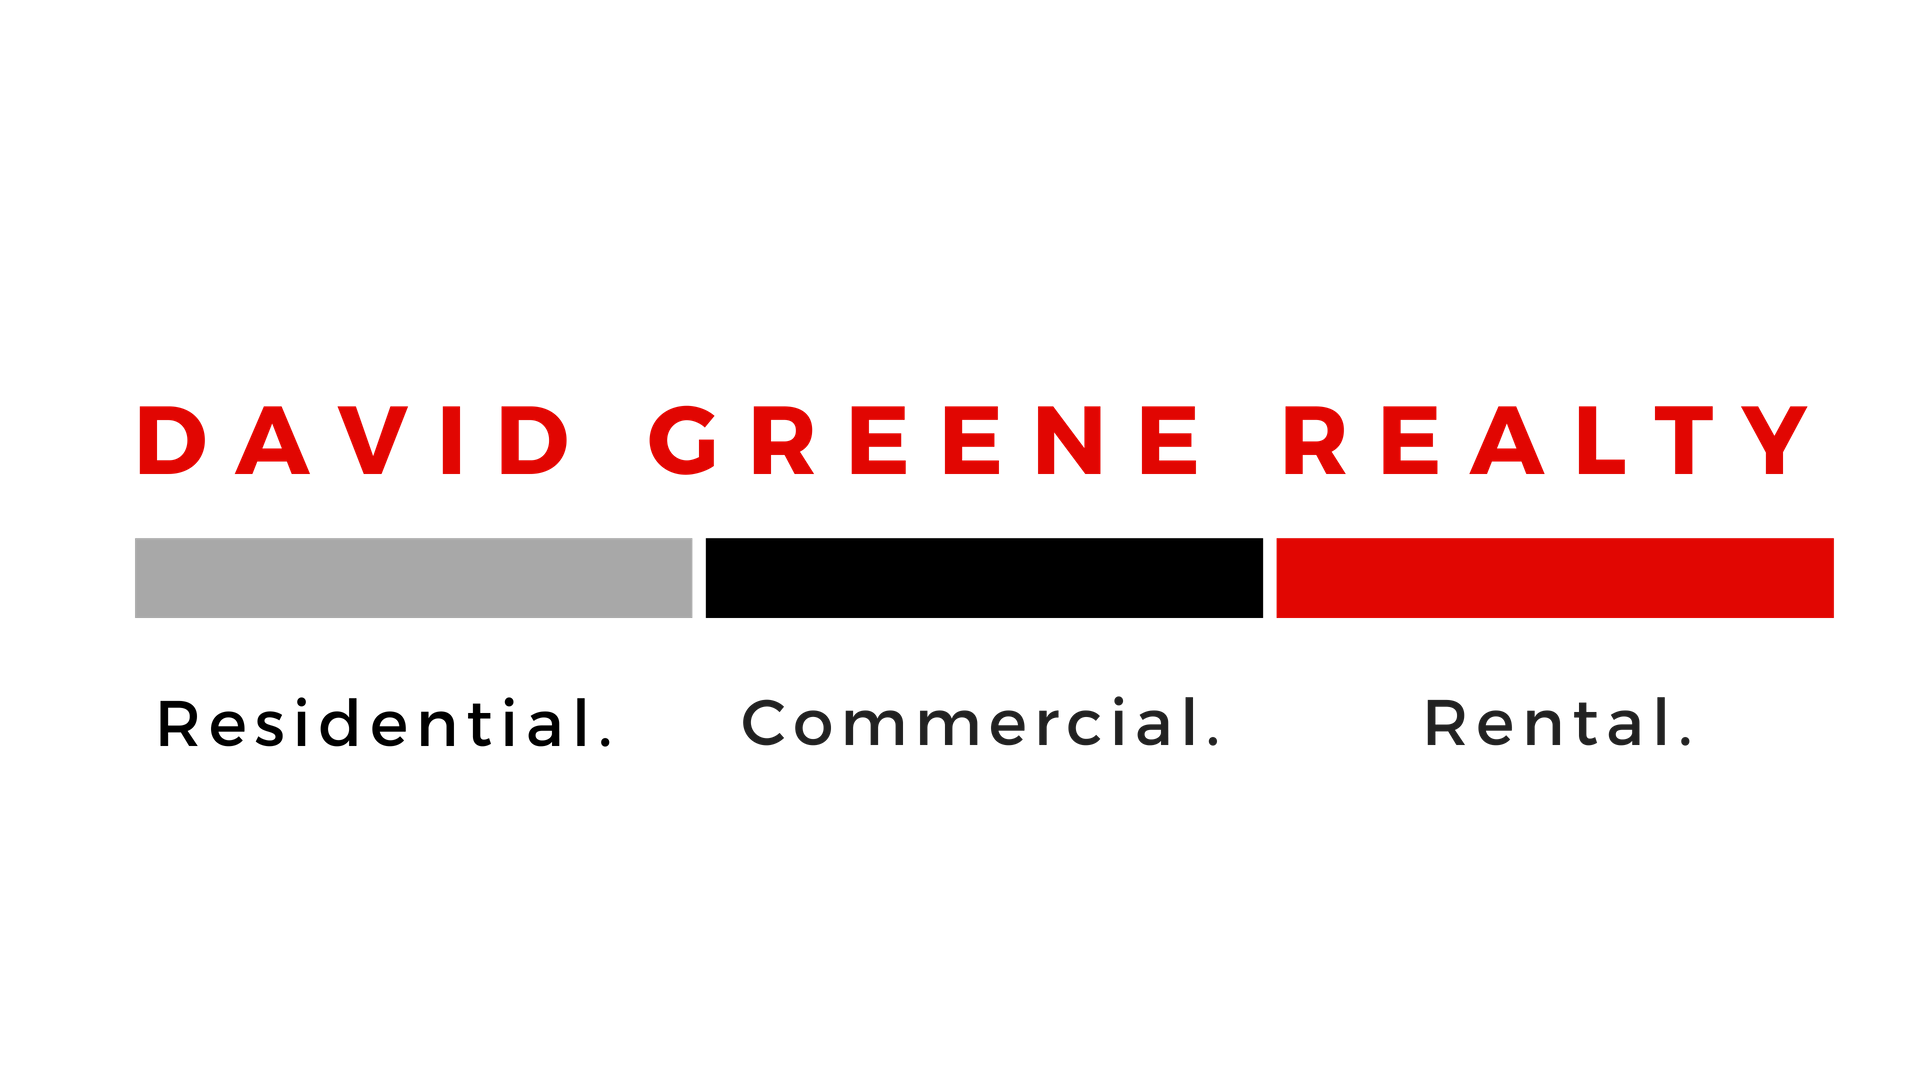 David Greene Realty